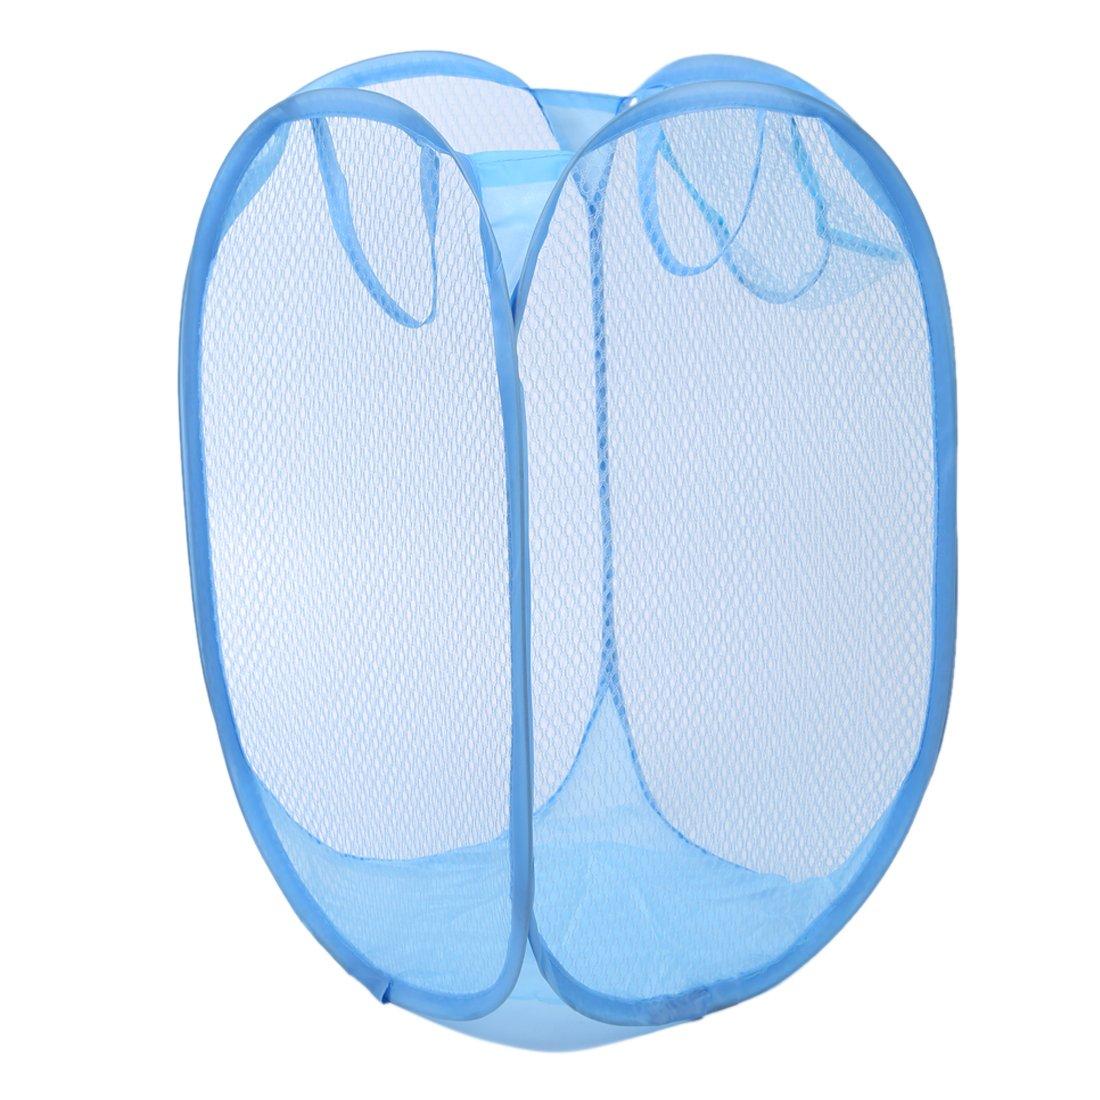 TOOGOO(R) Laundry Folding Square Basket Pop Up Hamper Clothes Storage Bin white Mesh fabric